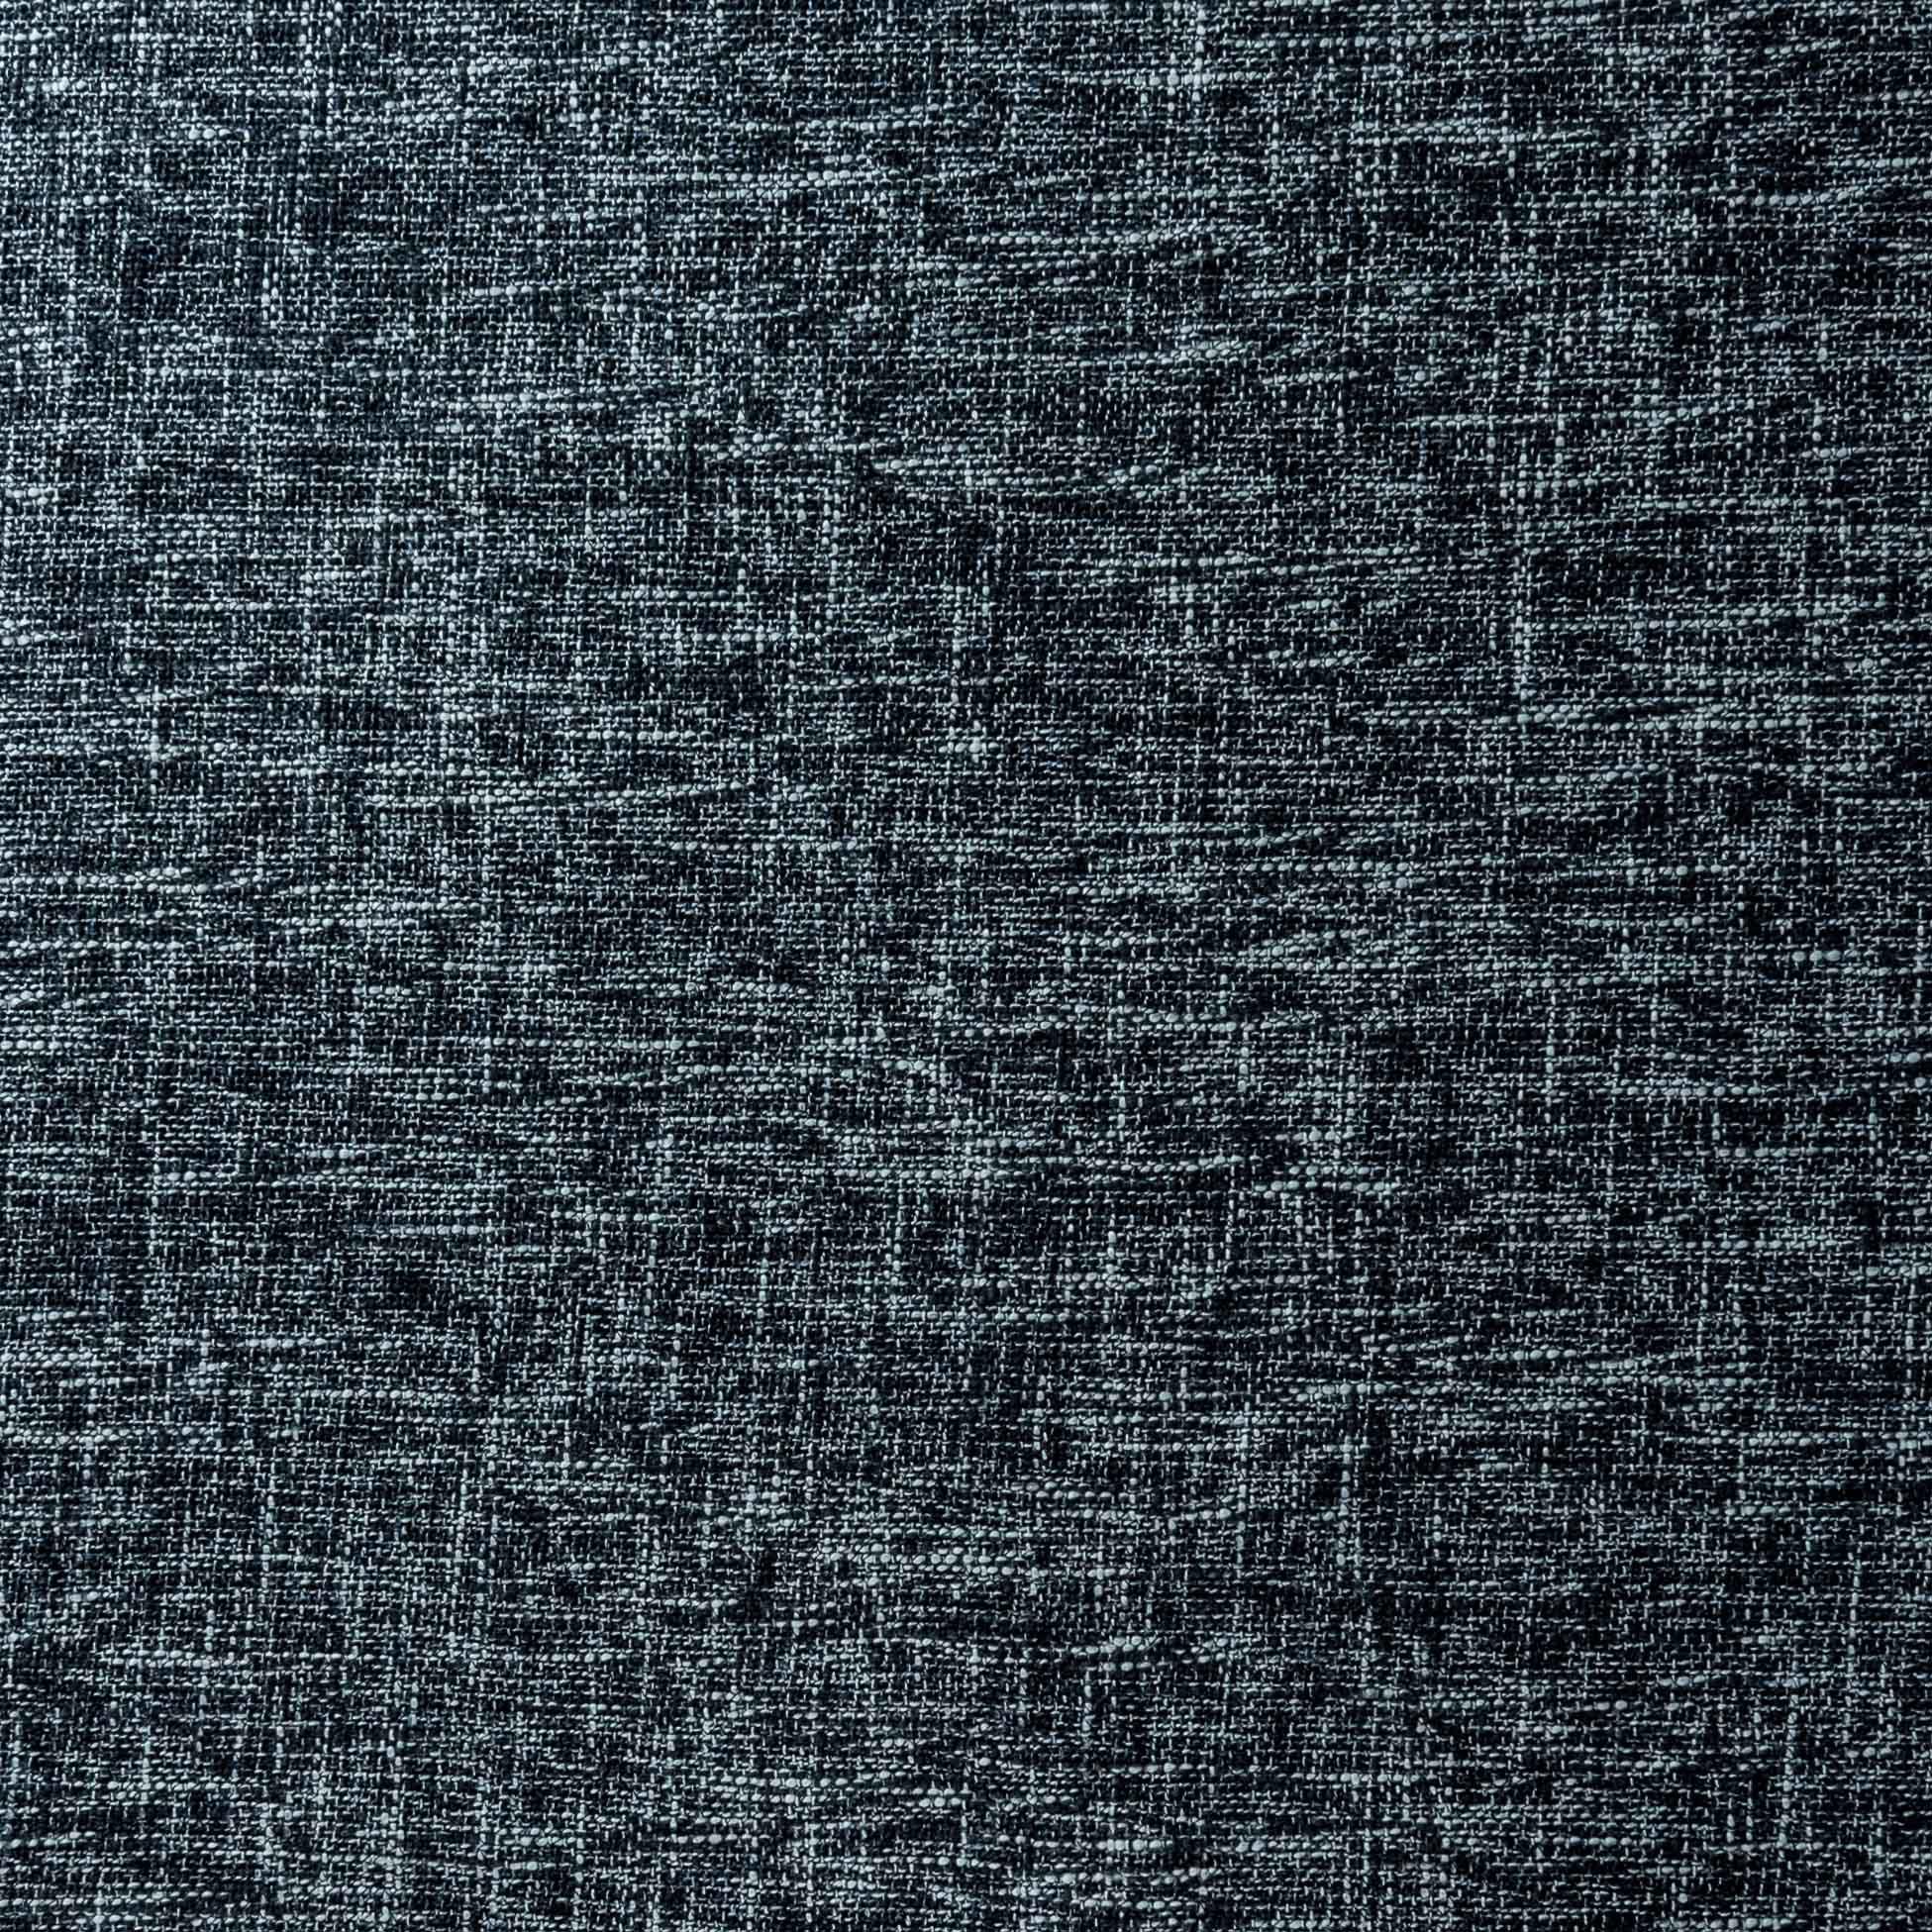 Black and White Tweed Tablecloth Rental by The Table NJ Chaya Sarah Thau